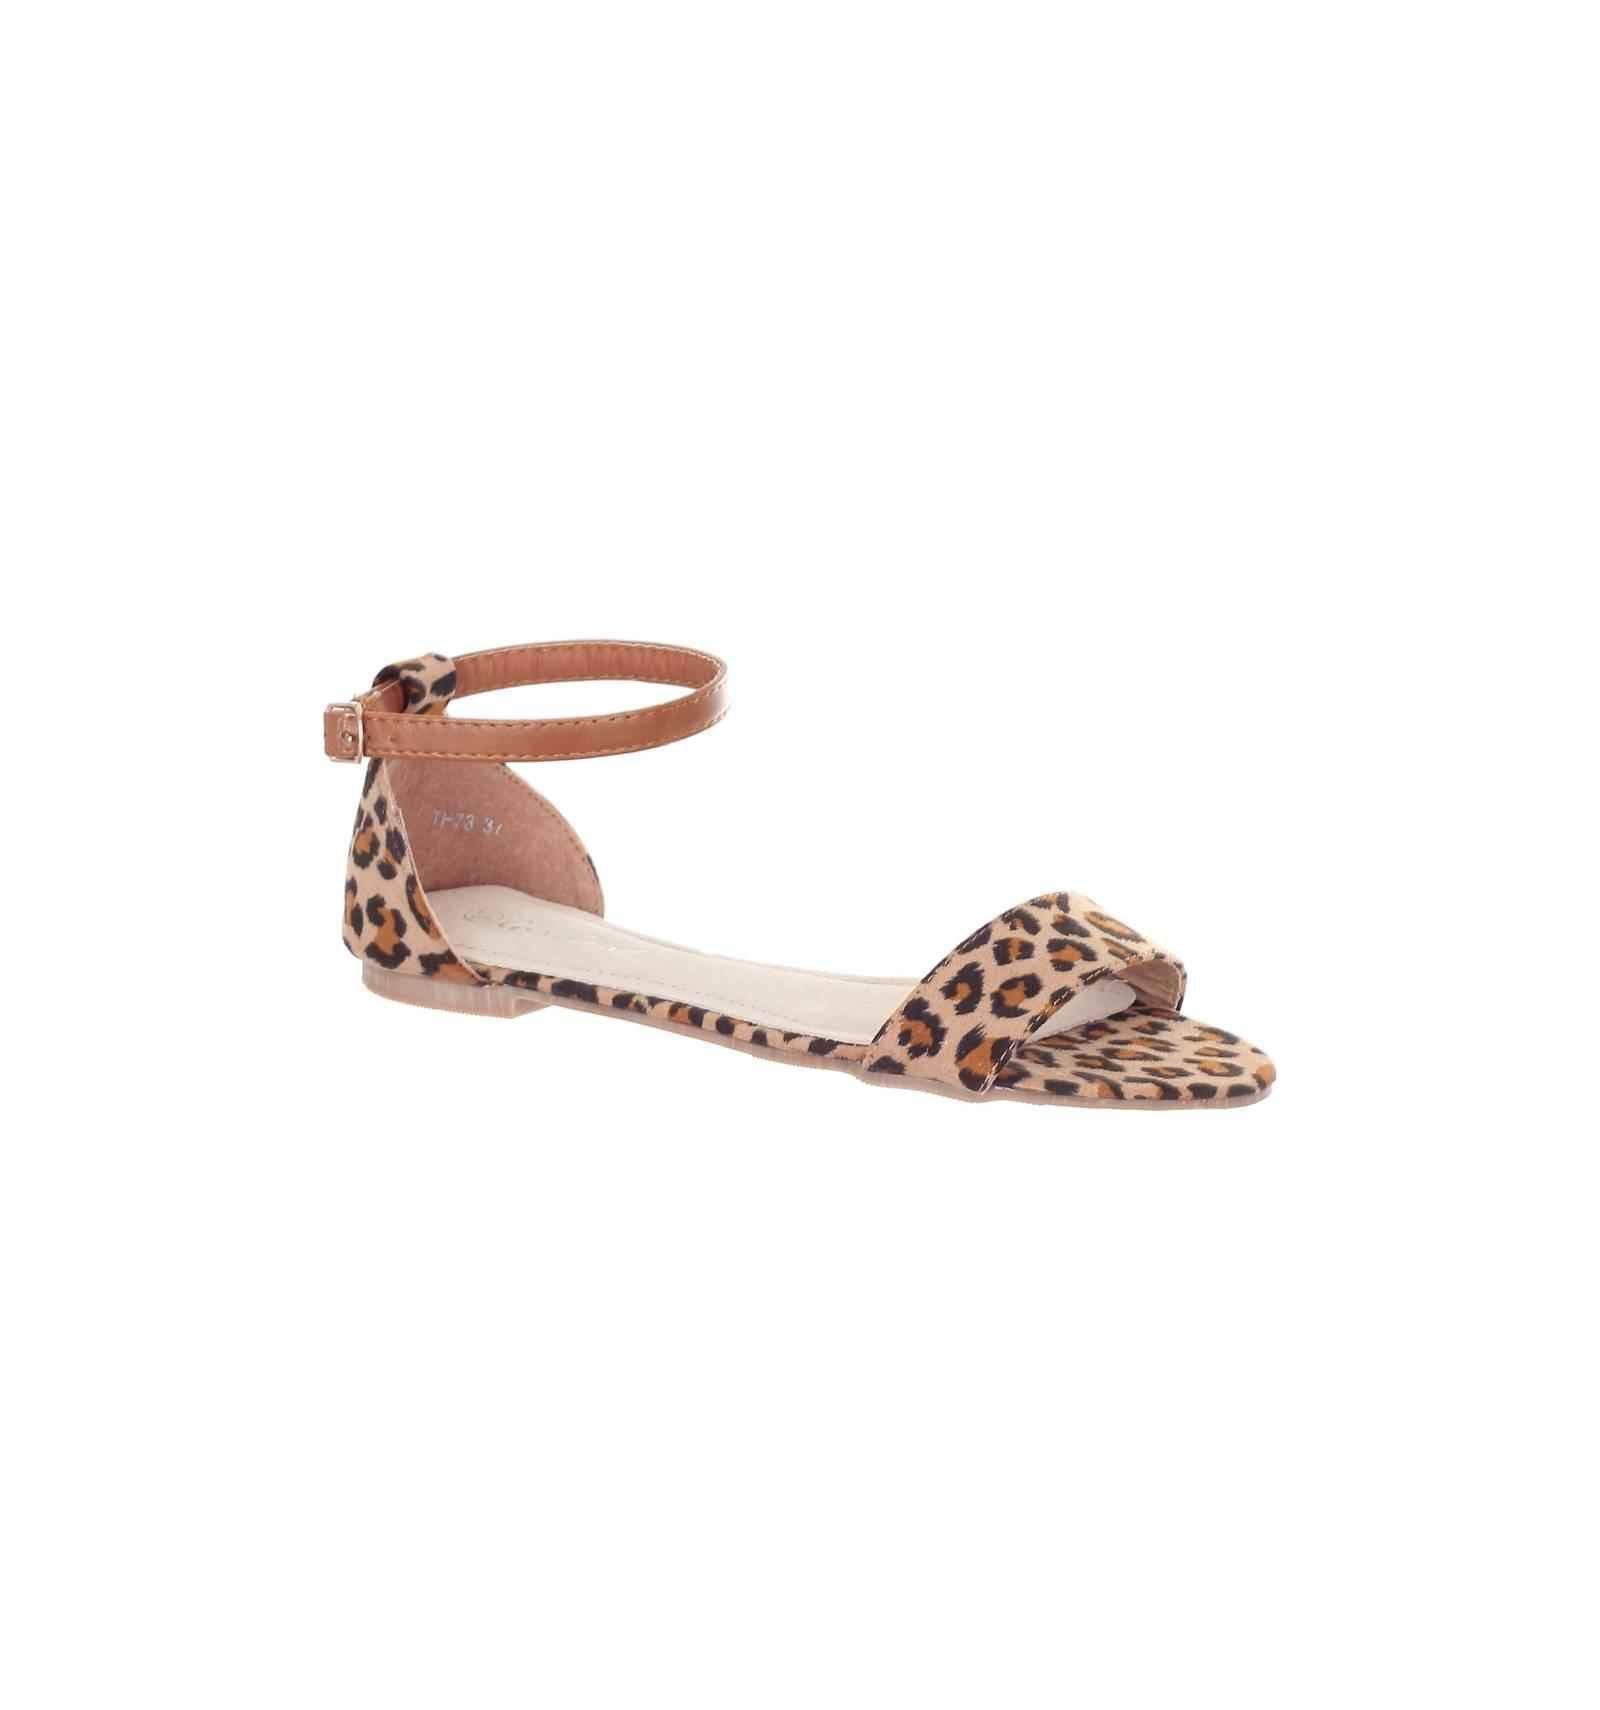 26aefb4f1278c Sandales femme aspect daim léopard Solène